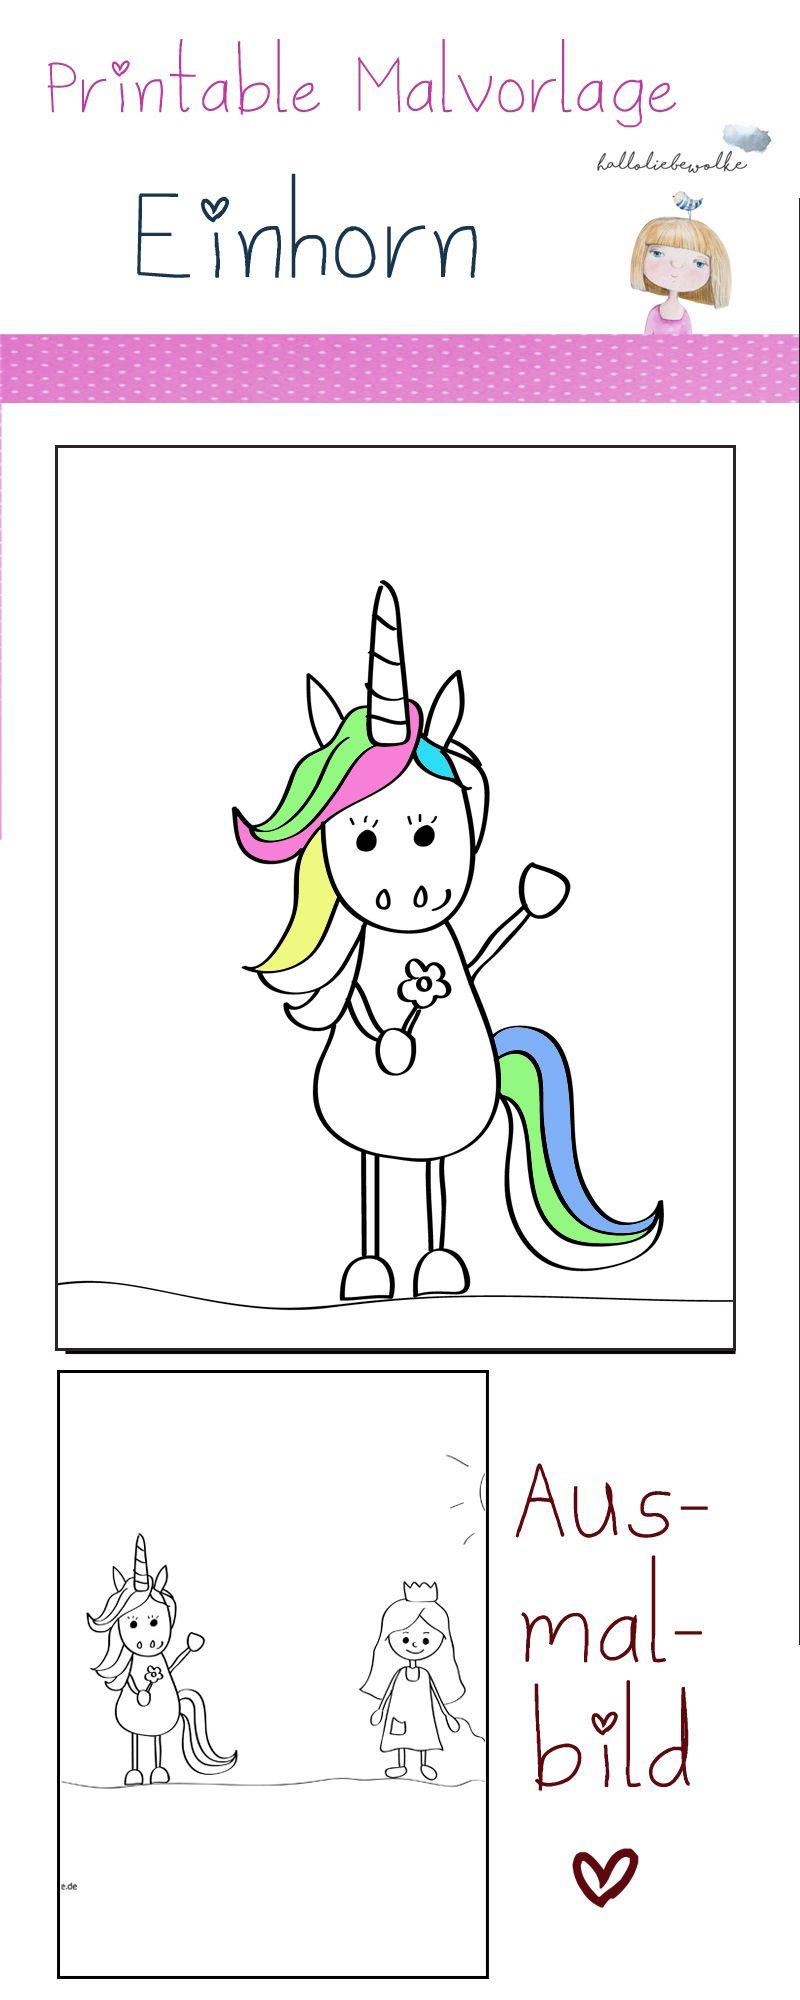 Ausmalbilder Lillifee Pferd : Printable Malvorlage Einhorn Und Prinzessin Malvorlage Einhorn